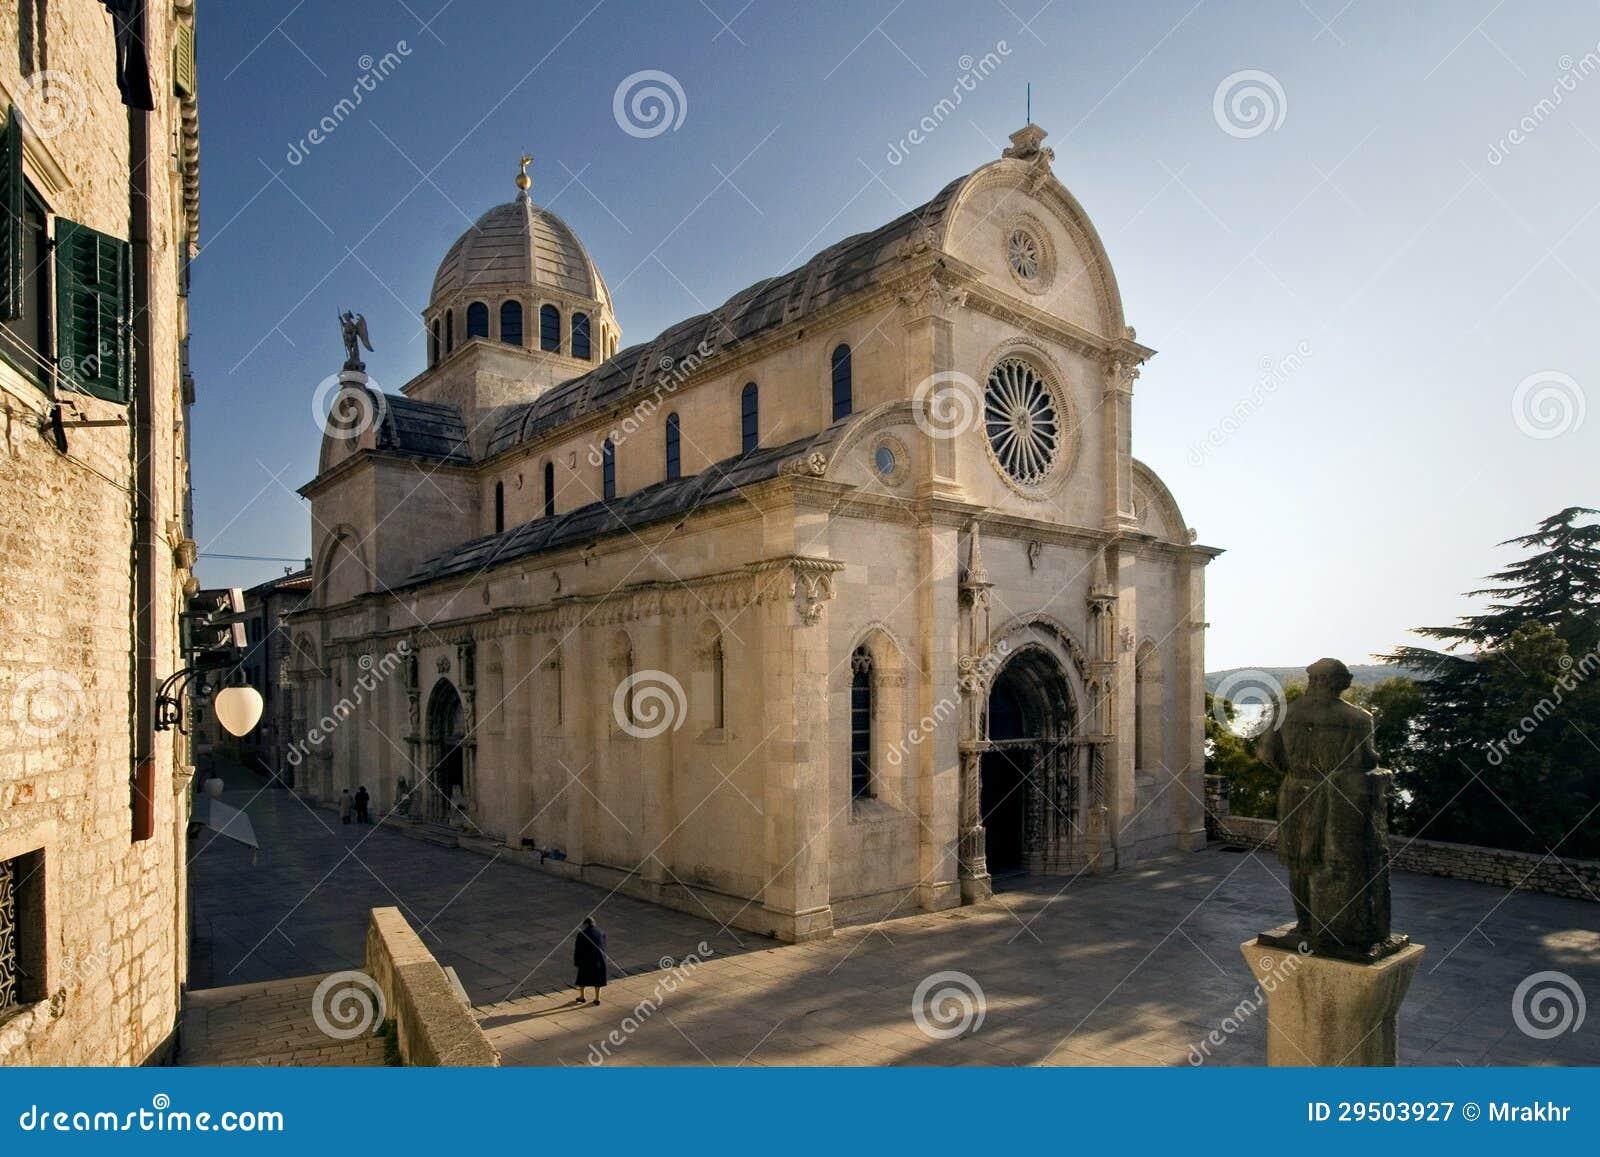 Kathedraal van St. James (SV Jakov) in Sibenik, Kroatië